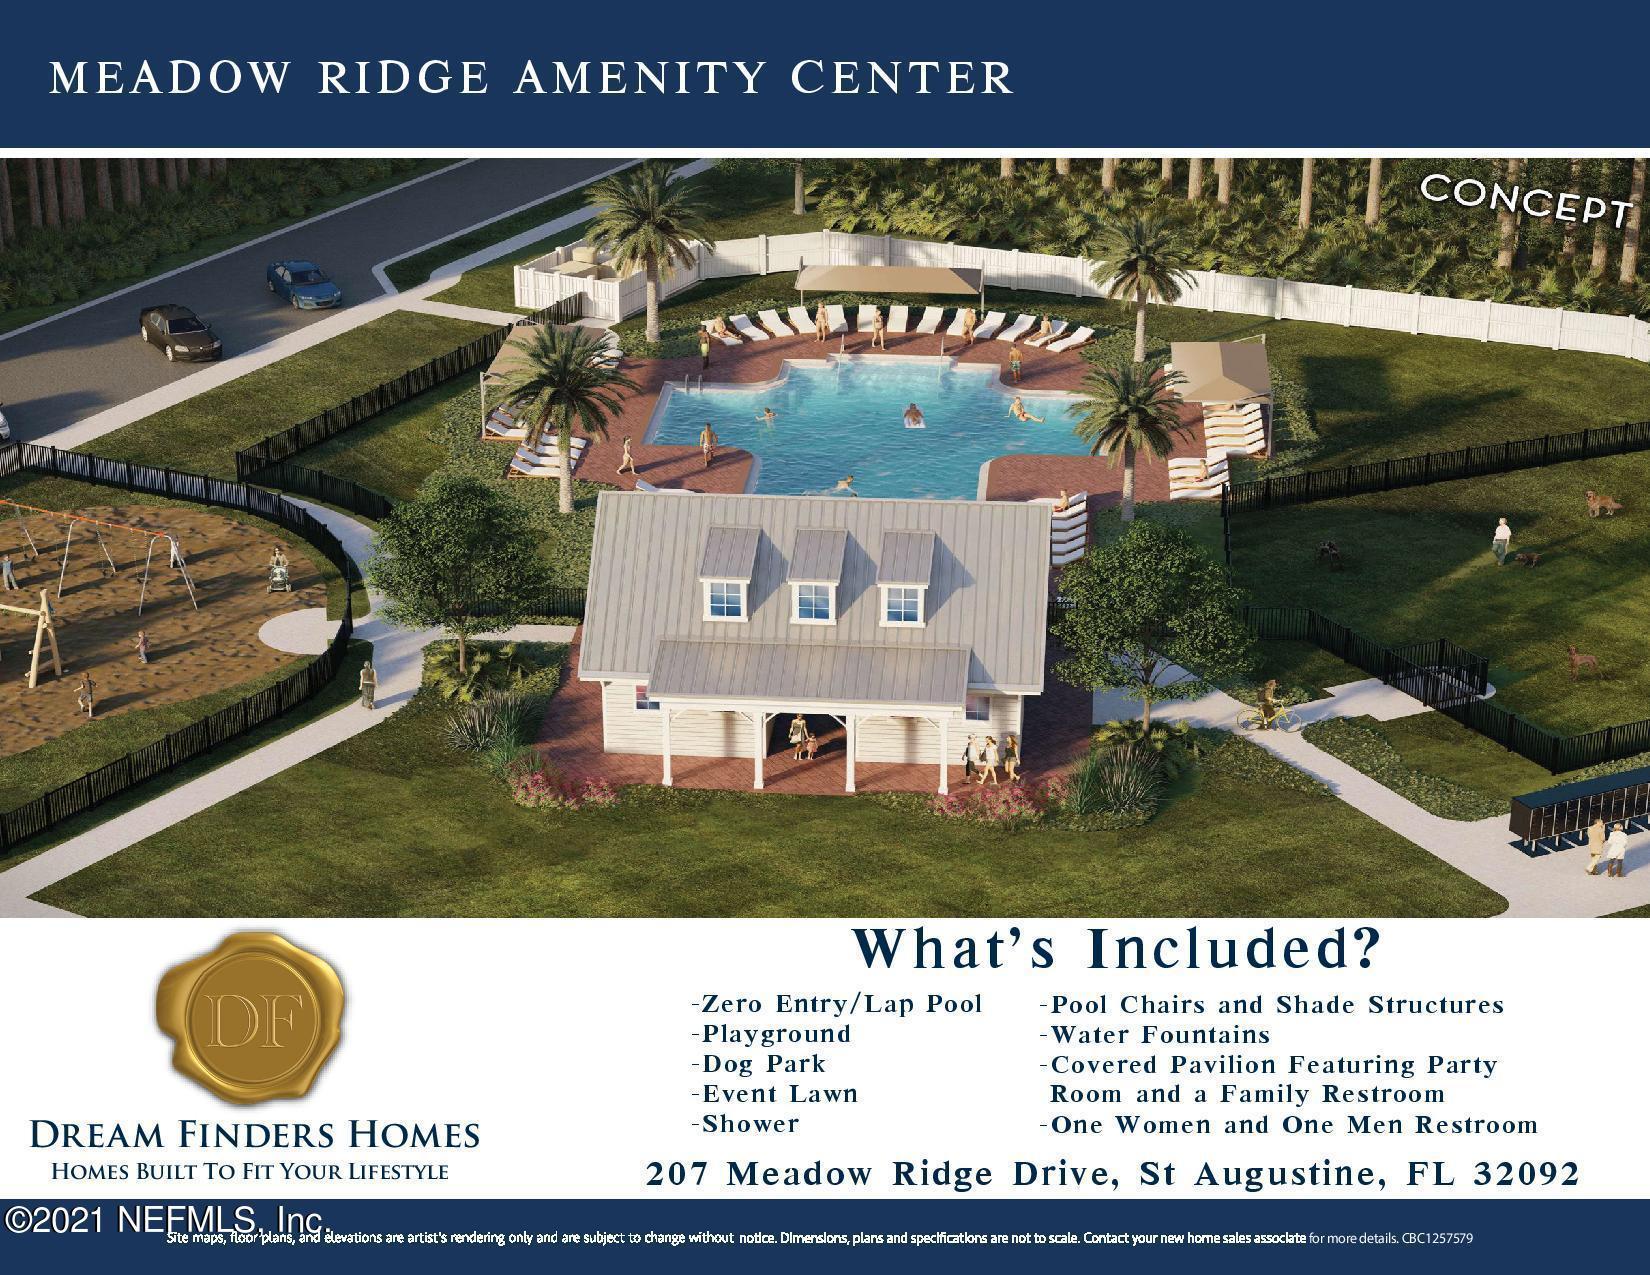 65 BIRCHFIELD, ST AUGUSTINE, FLORIDA 32092, 4 Bedrooms Bedrooms, ,3 BathroomsBathrooms,Residential,For sale,BIRCHFIELD,1065670